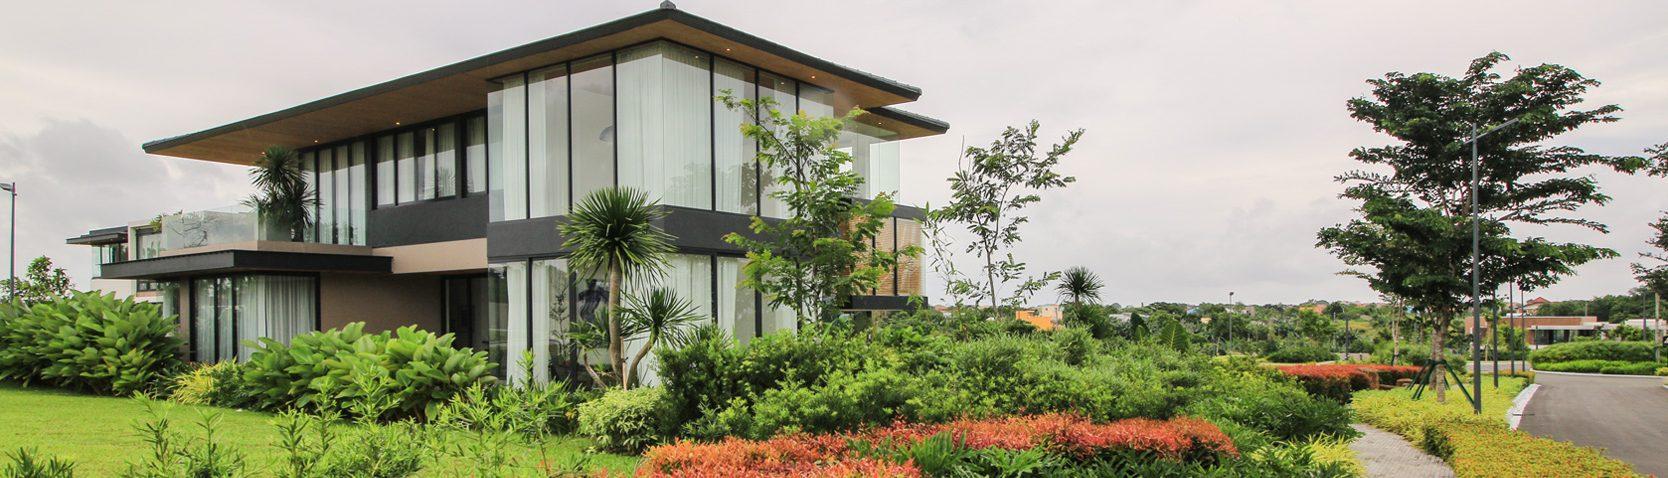 Enclave Alabang house